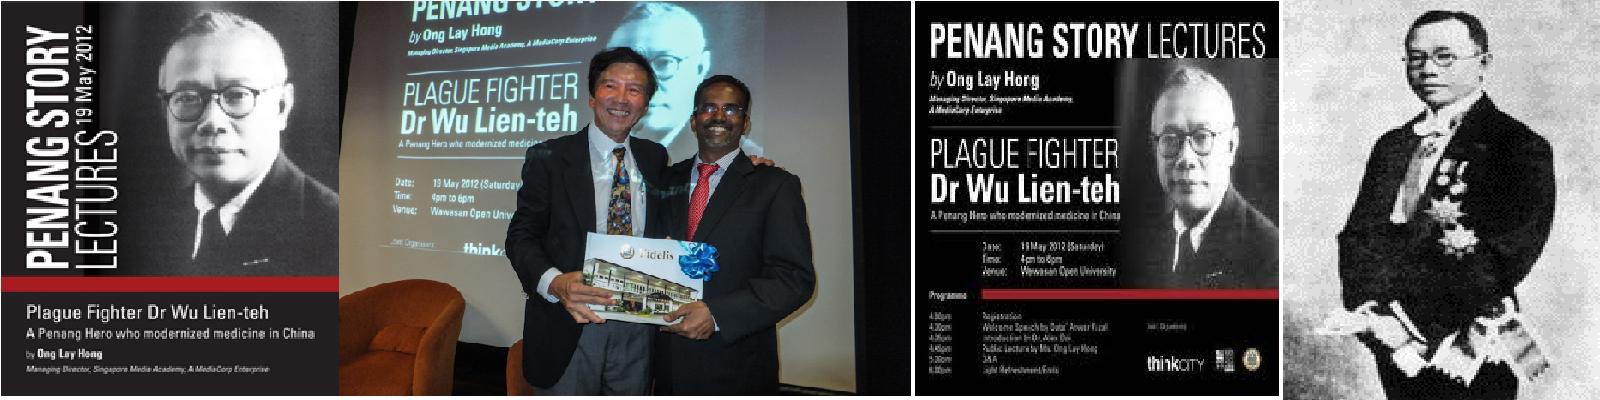 Penang Lectures - Dr Wu Lien Teh